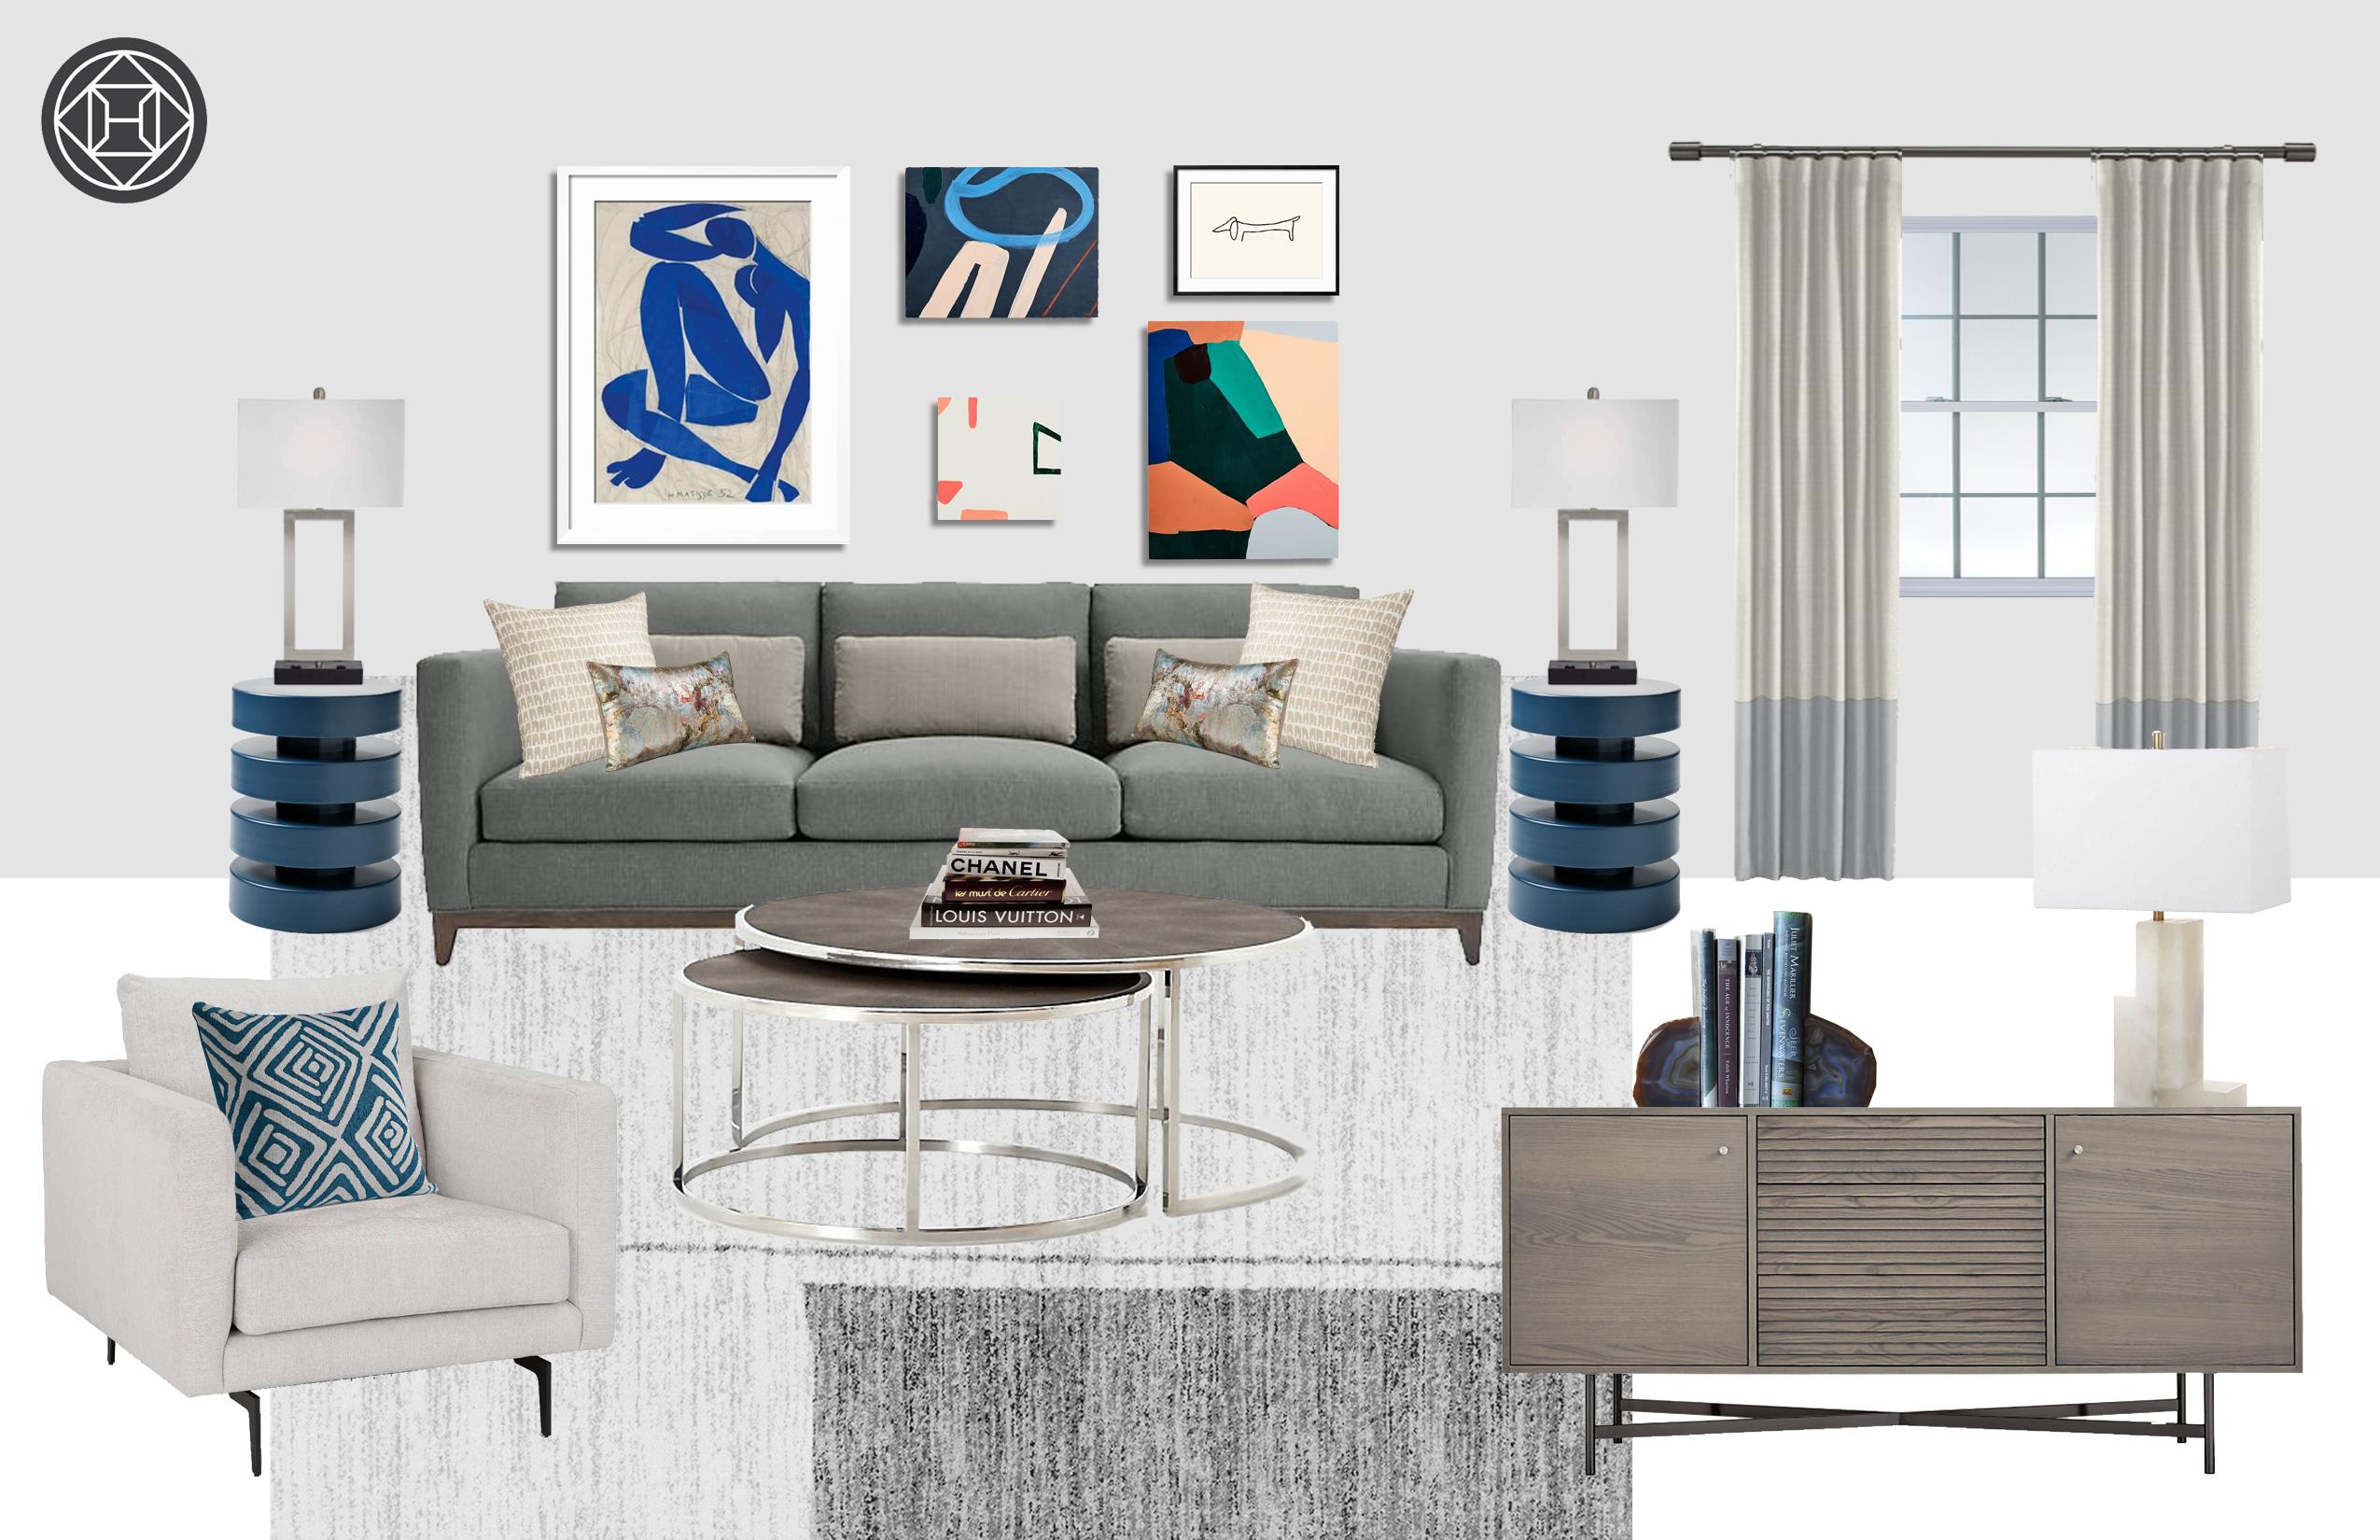 Wondrous Contemporary Design By Havenly Interior Designer Kelsie Pdpeps Interior Chair Design Pdpepsorg